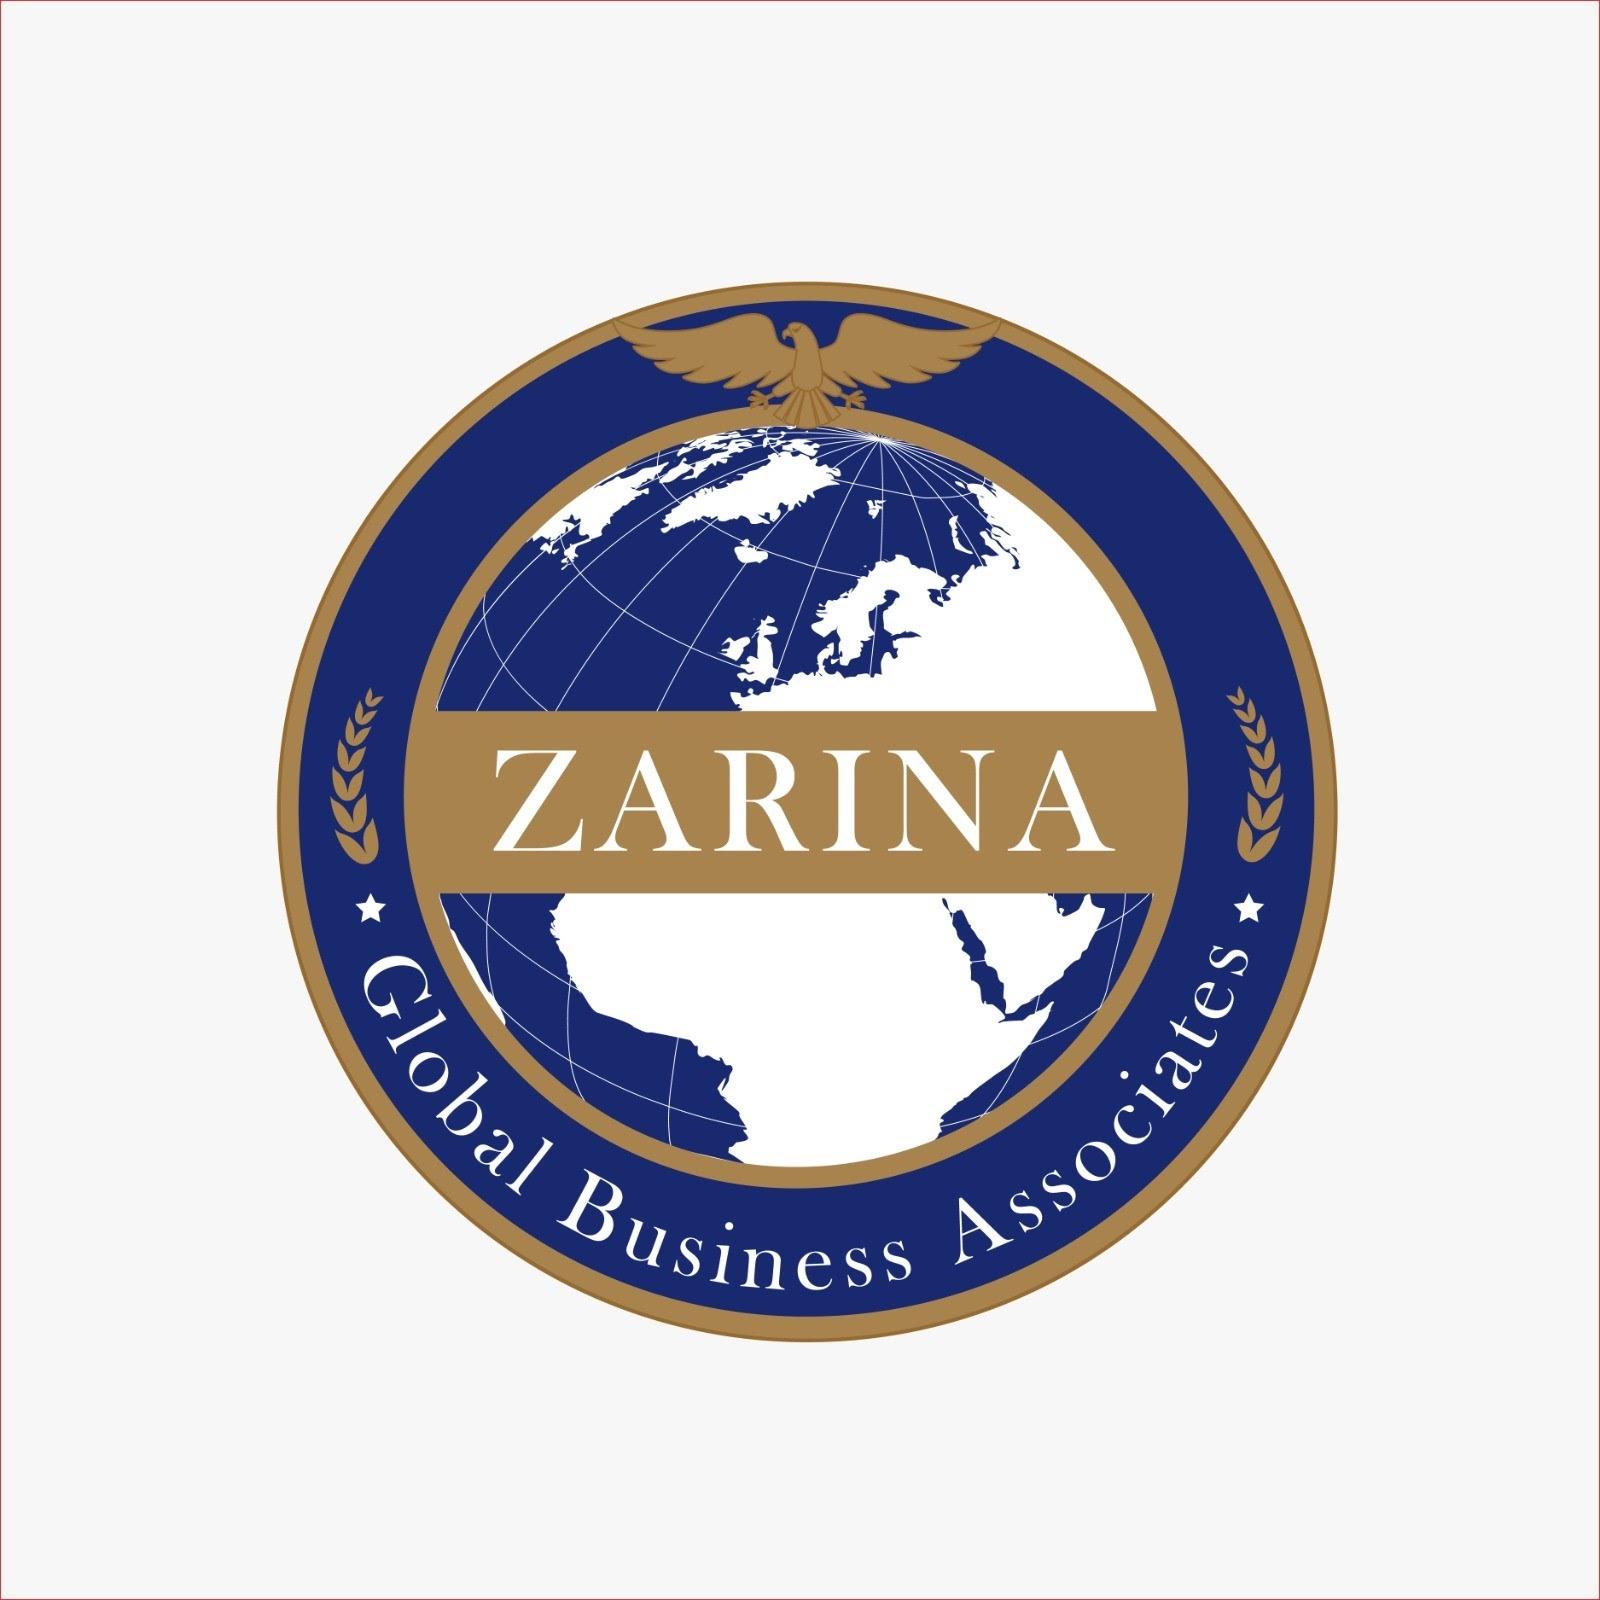 Zarina Global Business Associates Unveils Innovative Online Staff Training Program